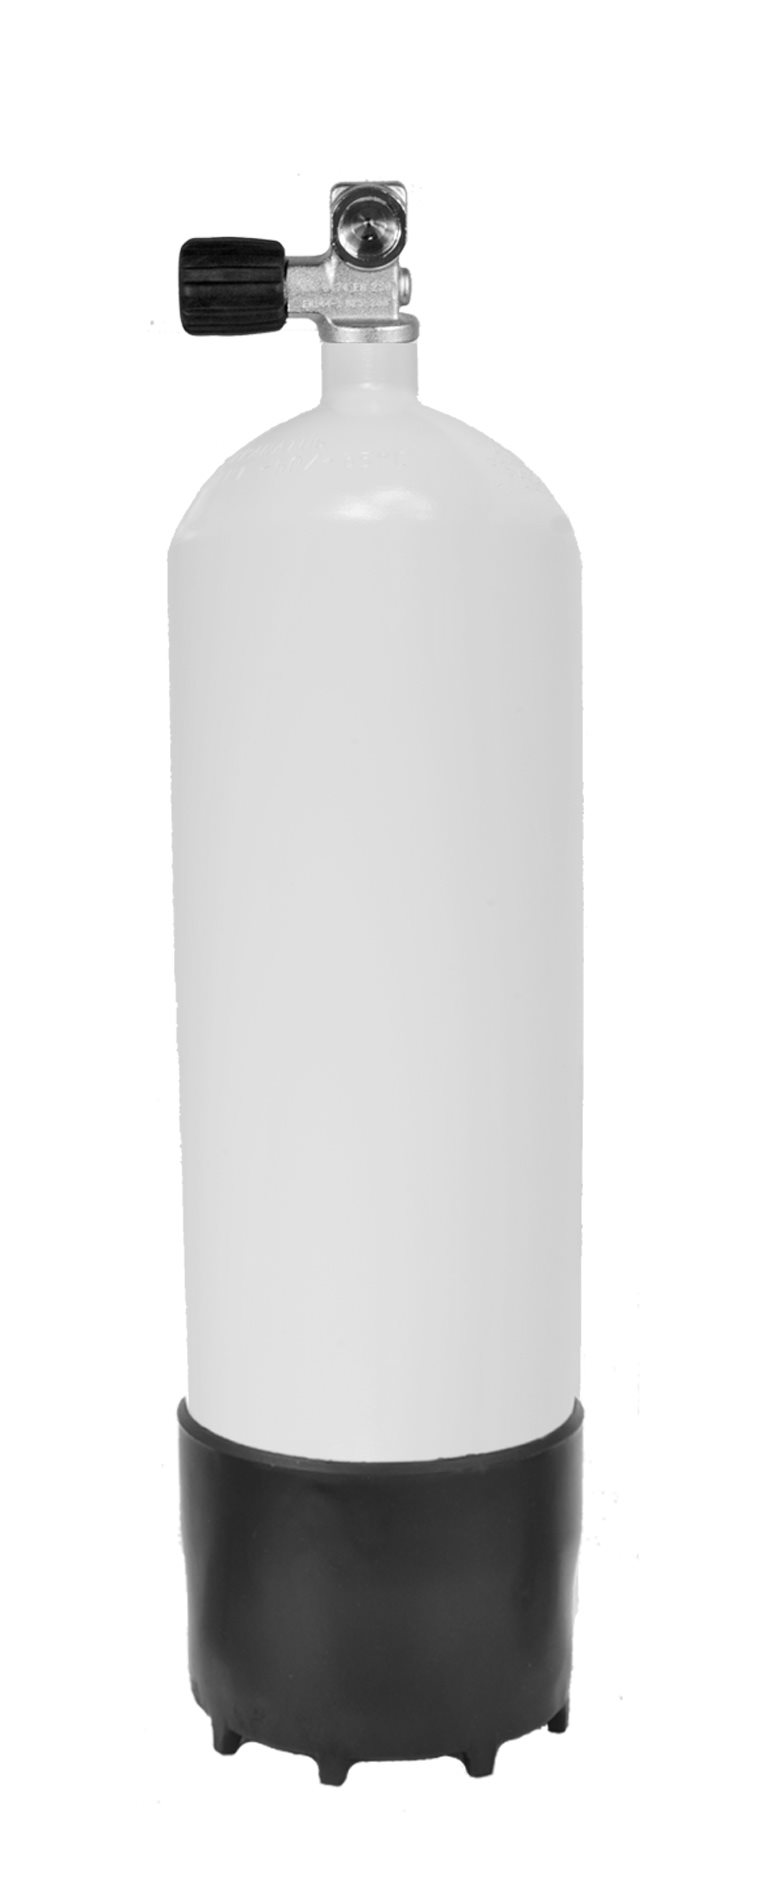 Водолазна бутилка 10 л / 232 бара – Eurocylinder